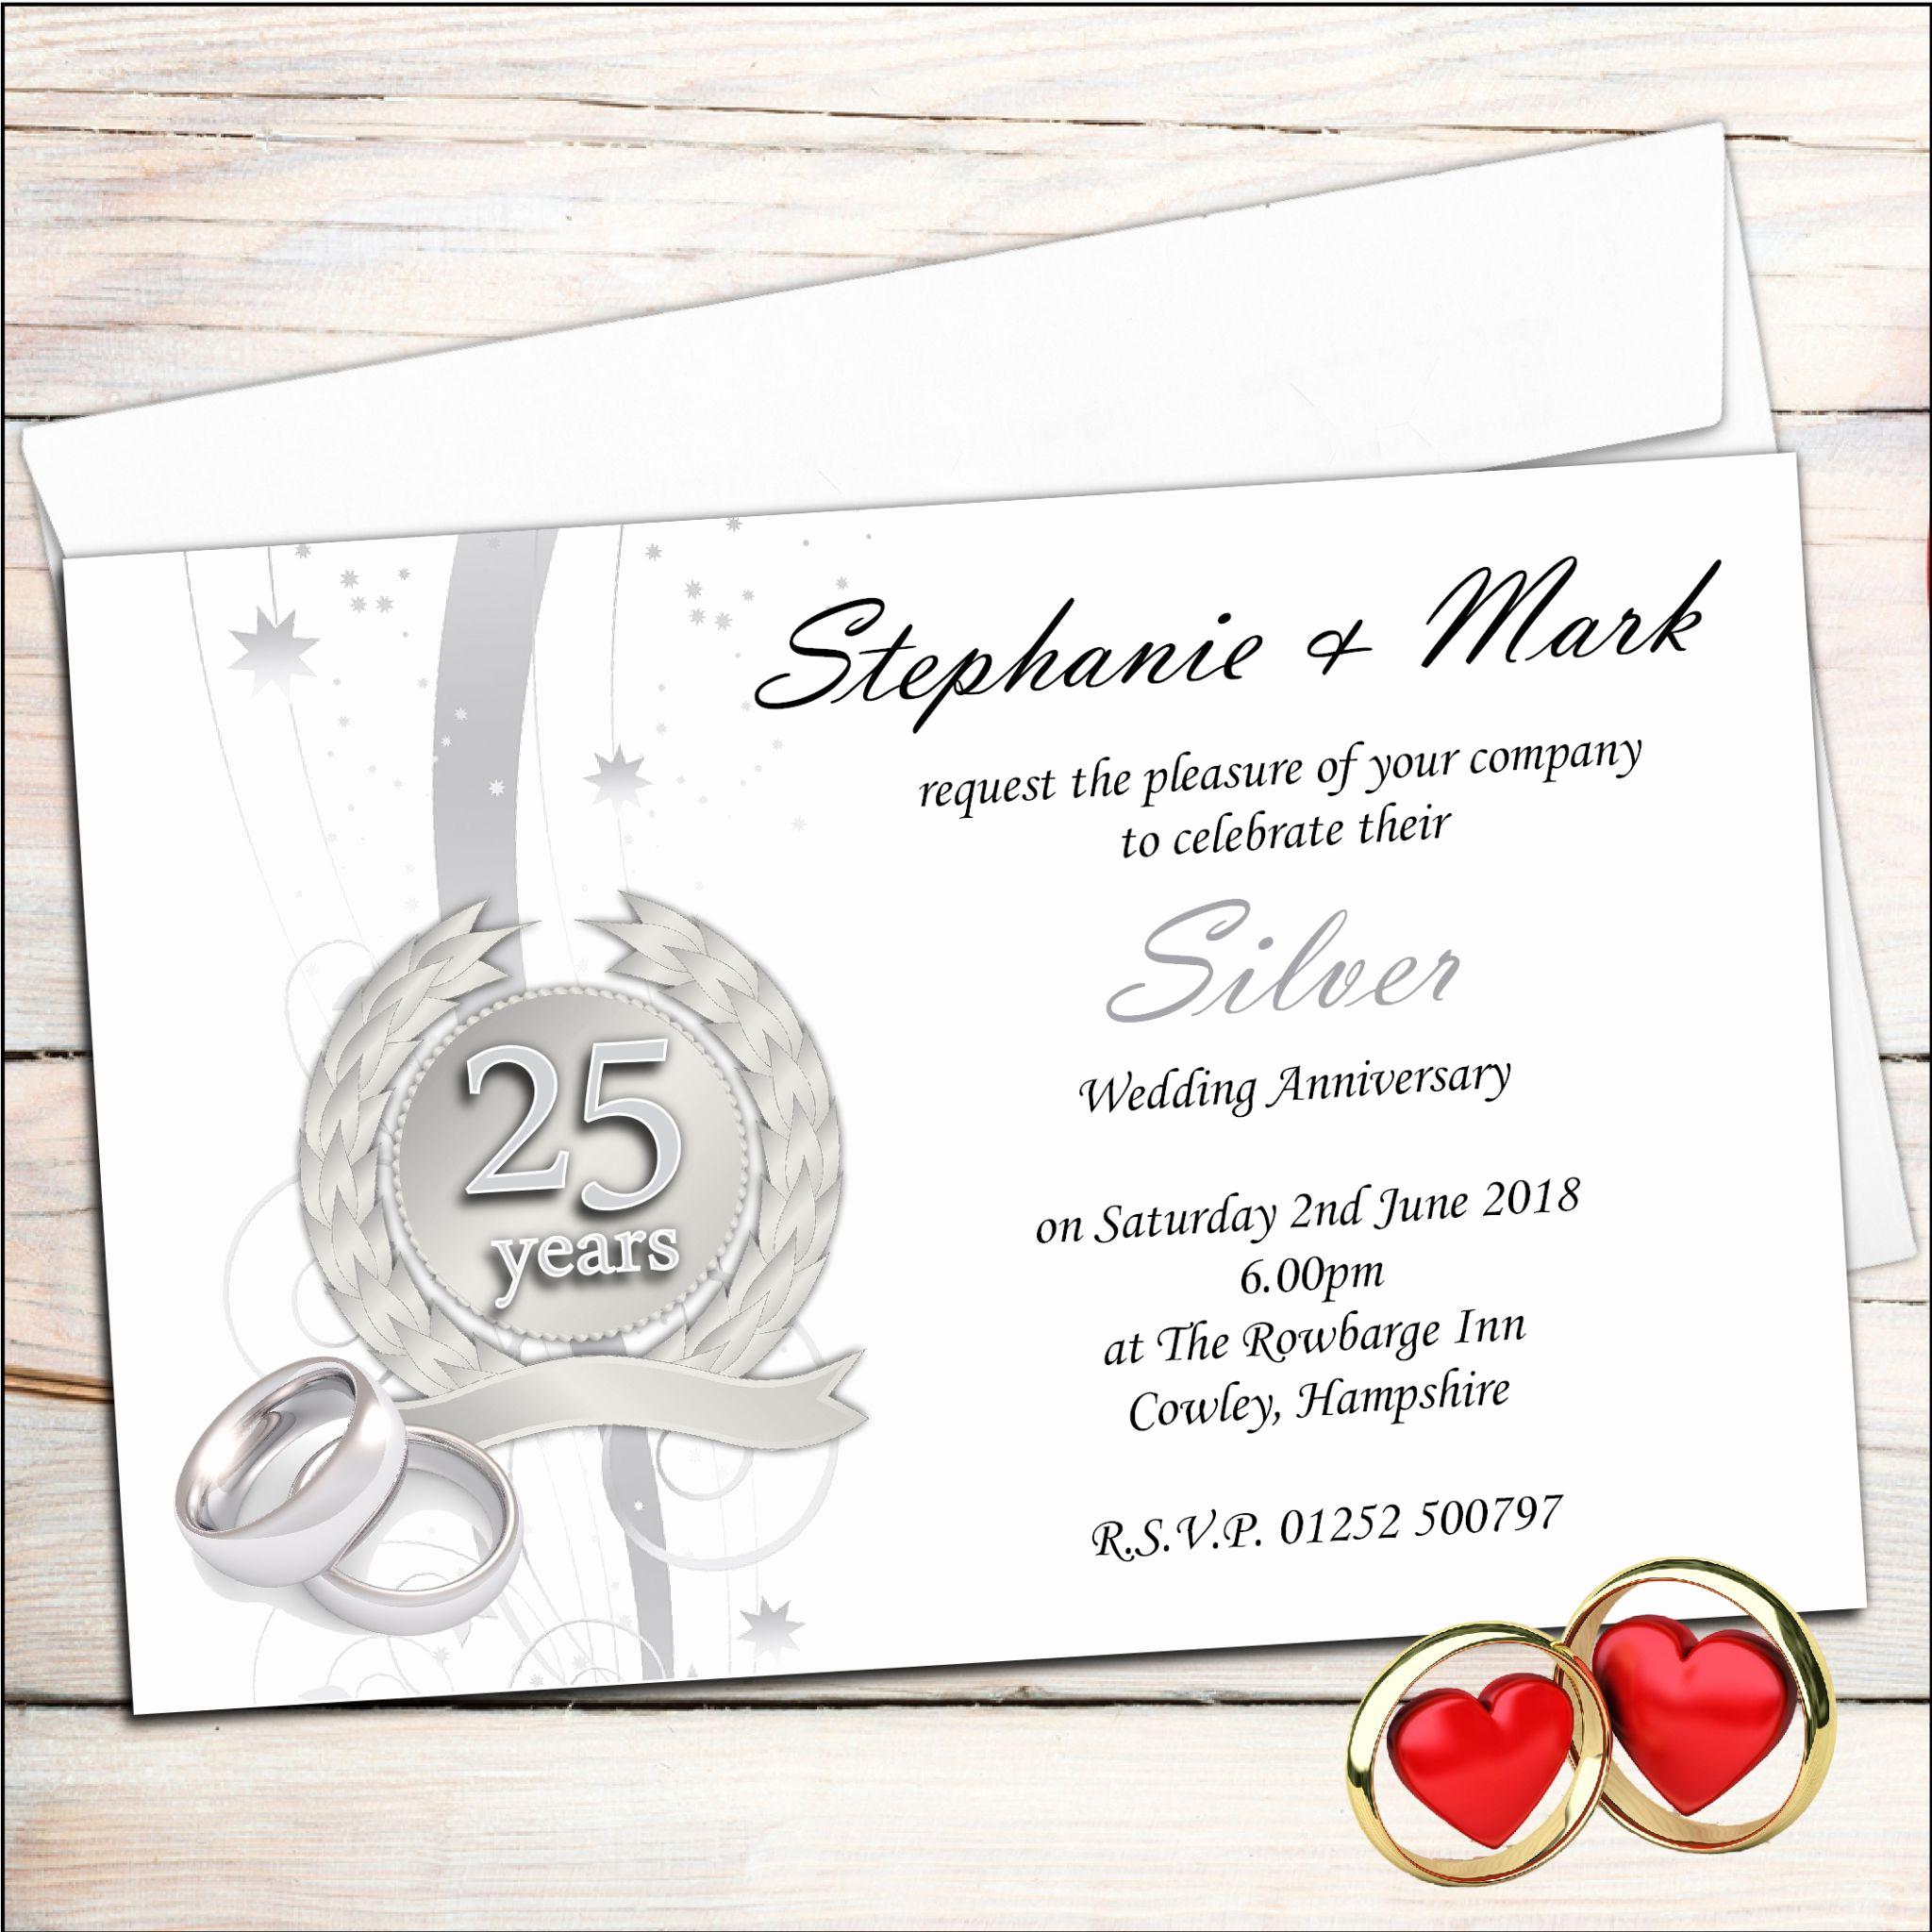 Wedding Anniversary Invitation Template Best Of Anniversary Invitations 25th Silver Wedding Anniversary